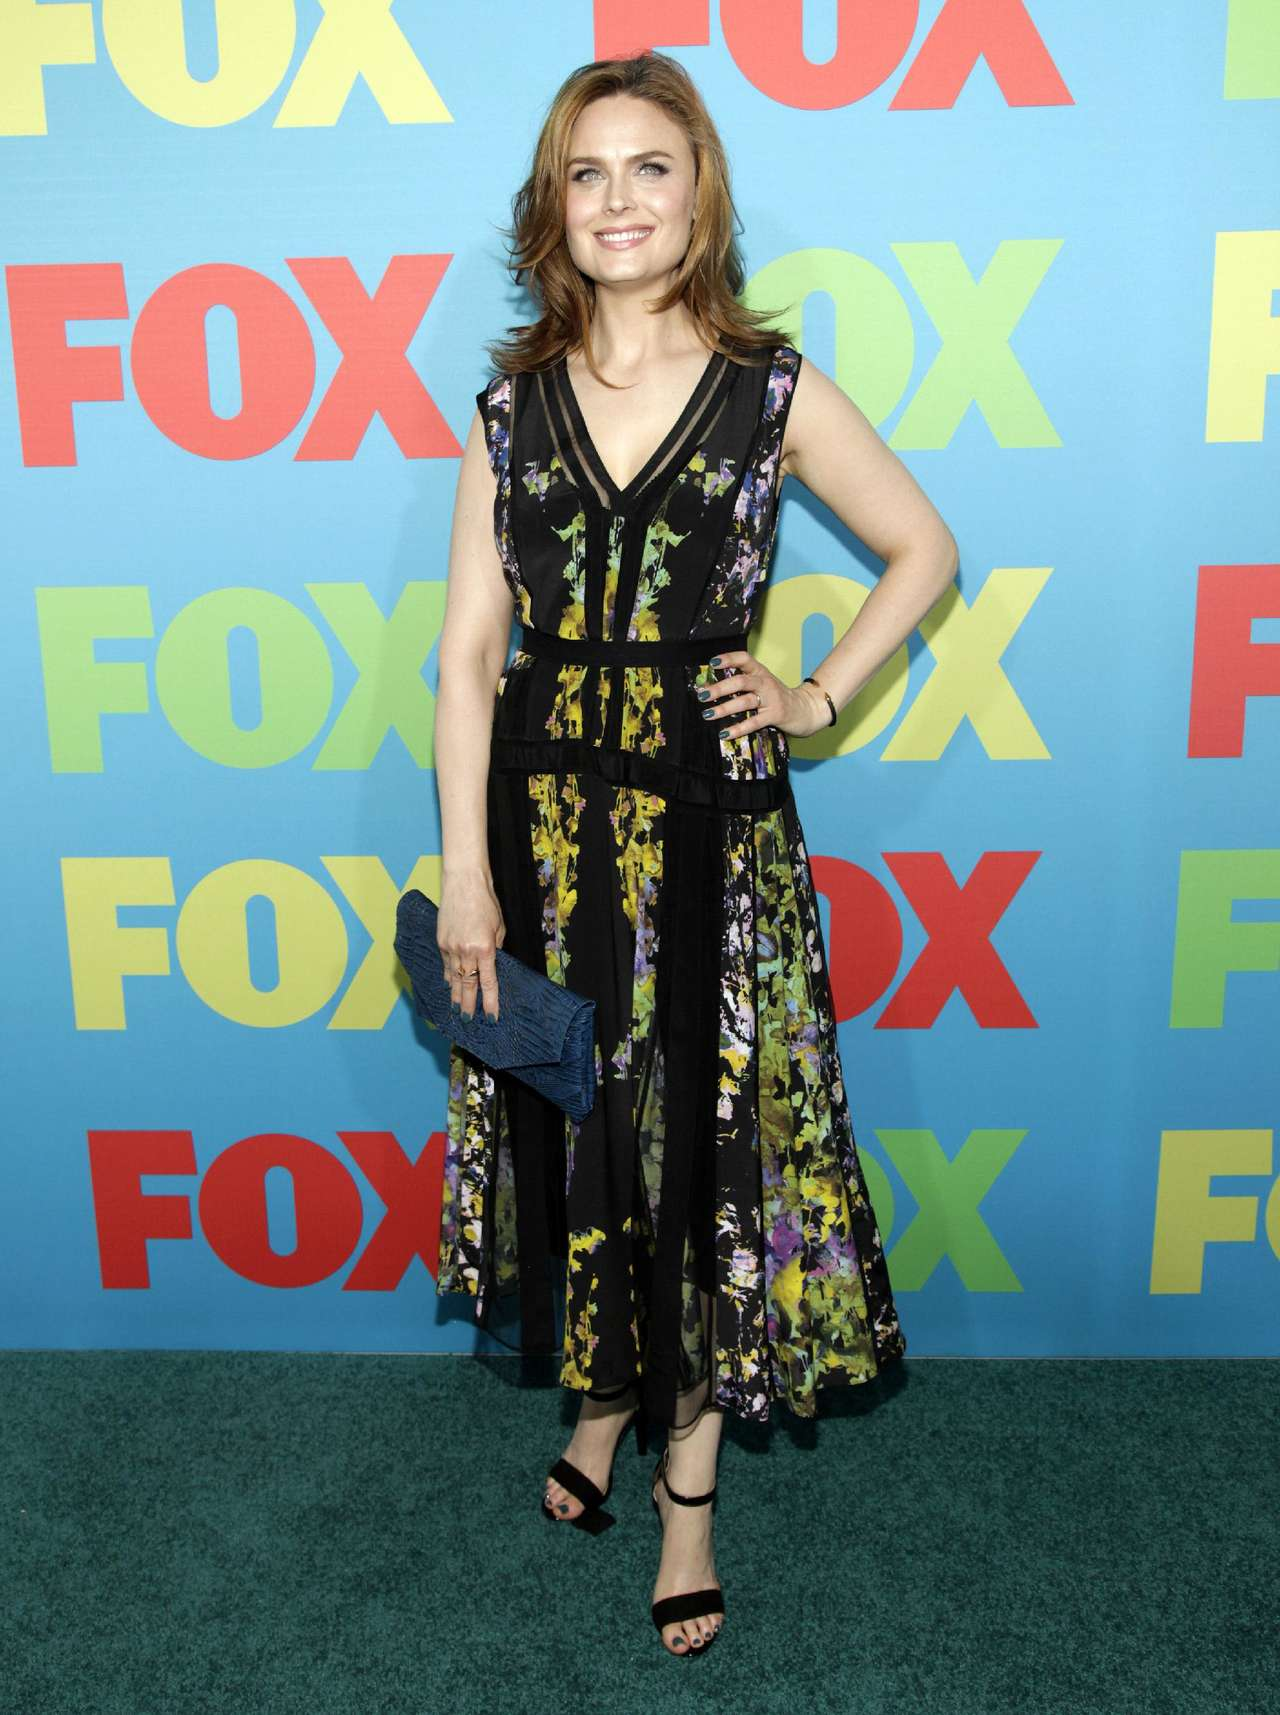 Emily Deschanel FOX Network Upfront event